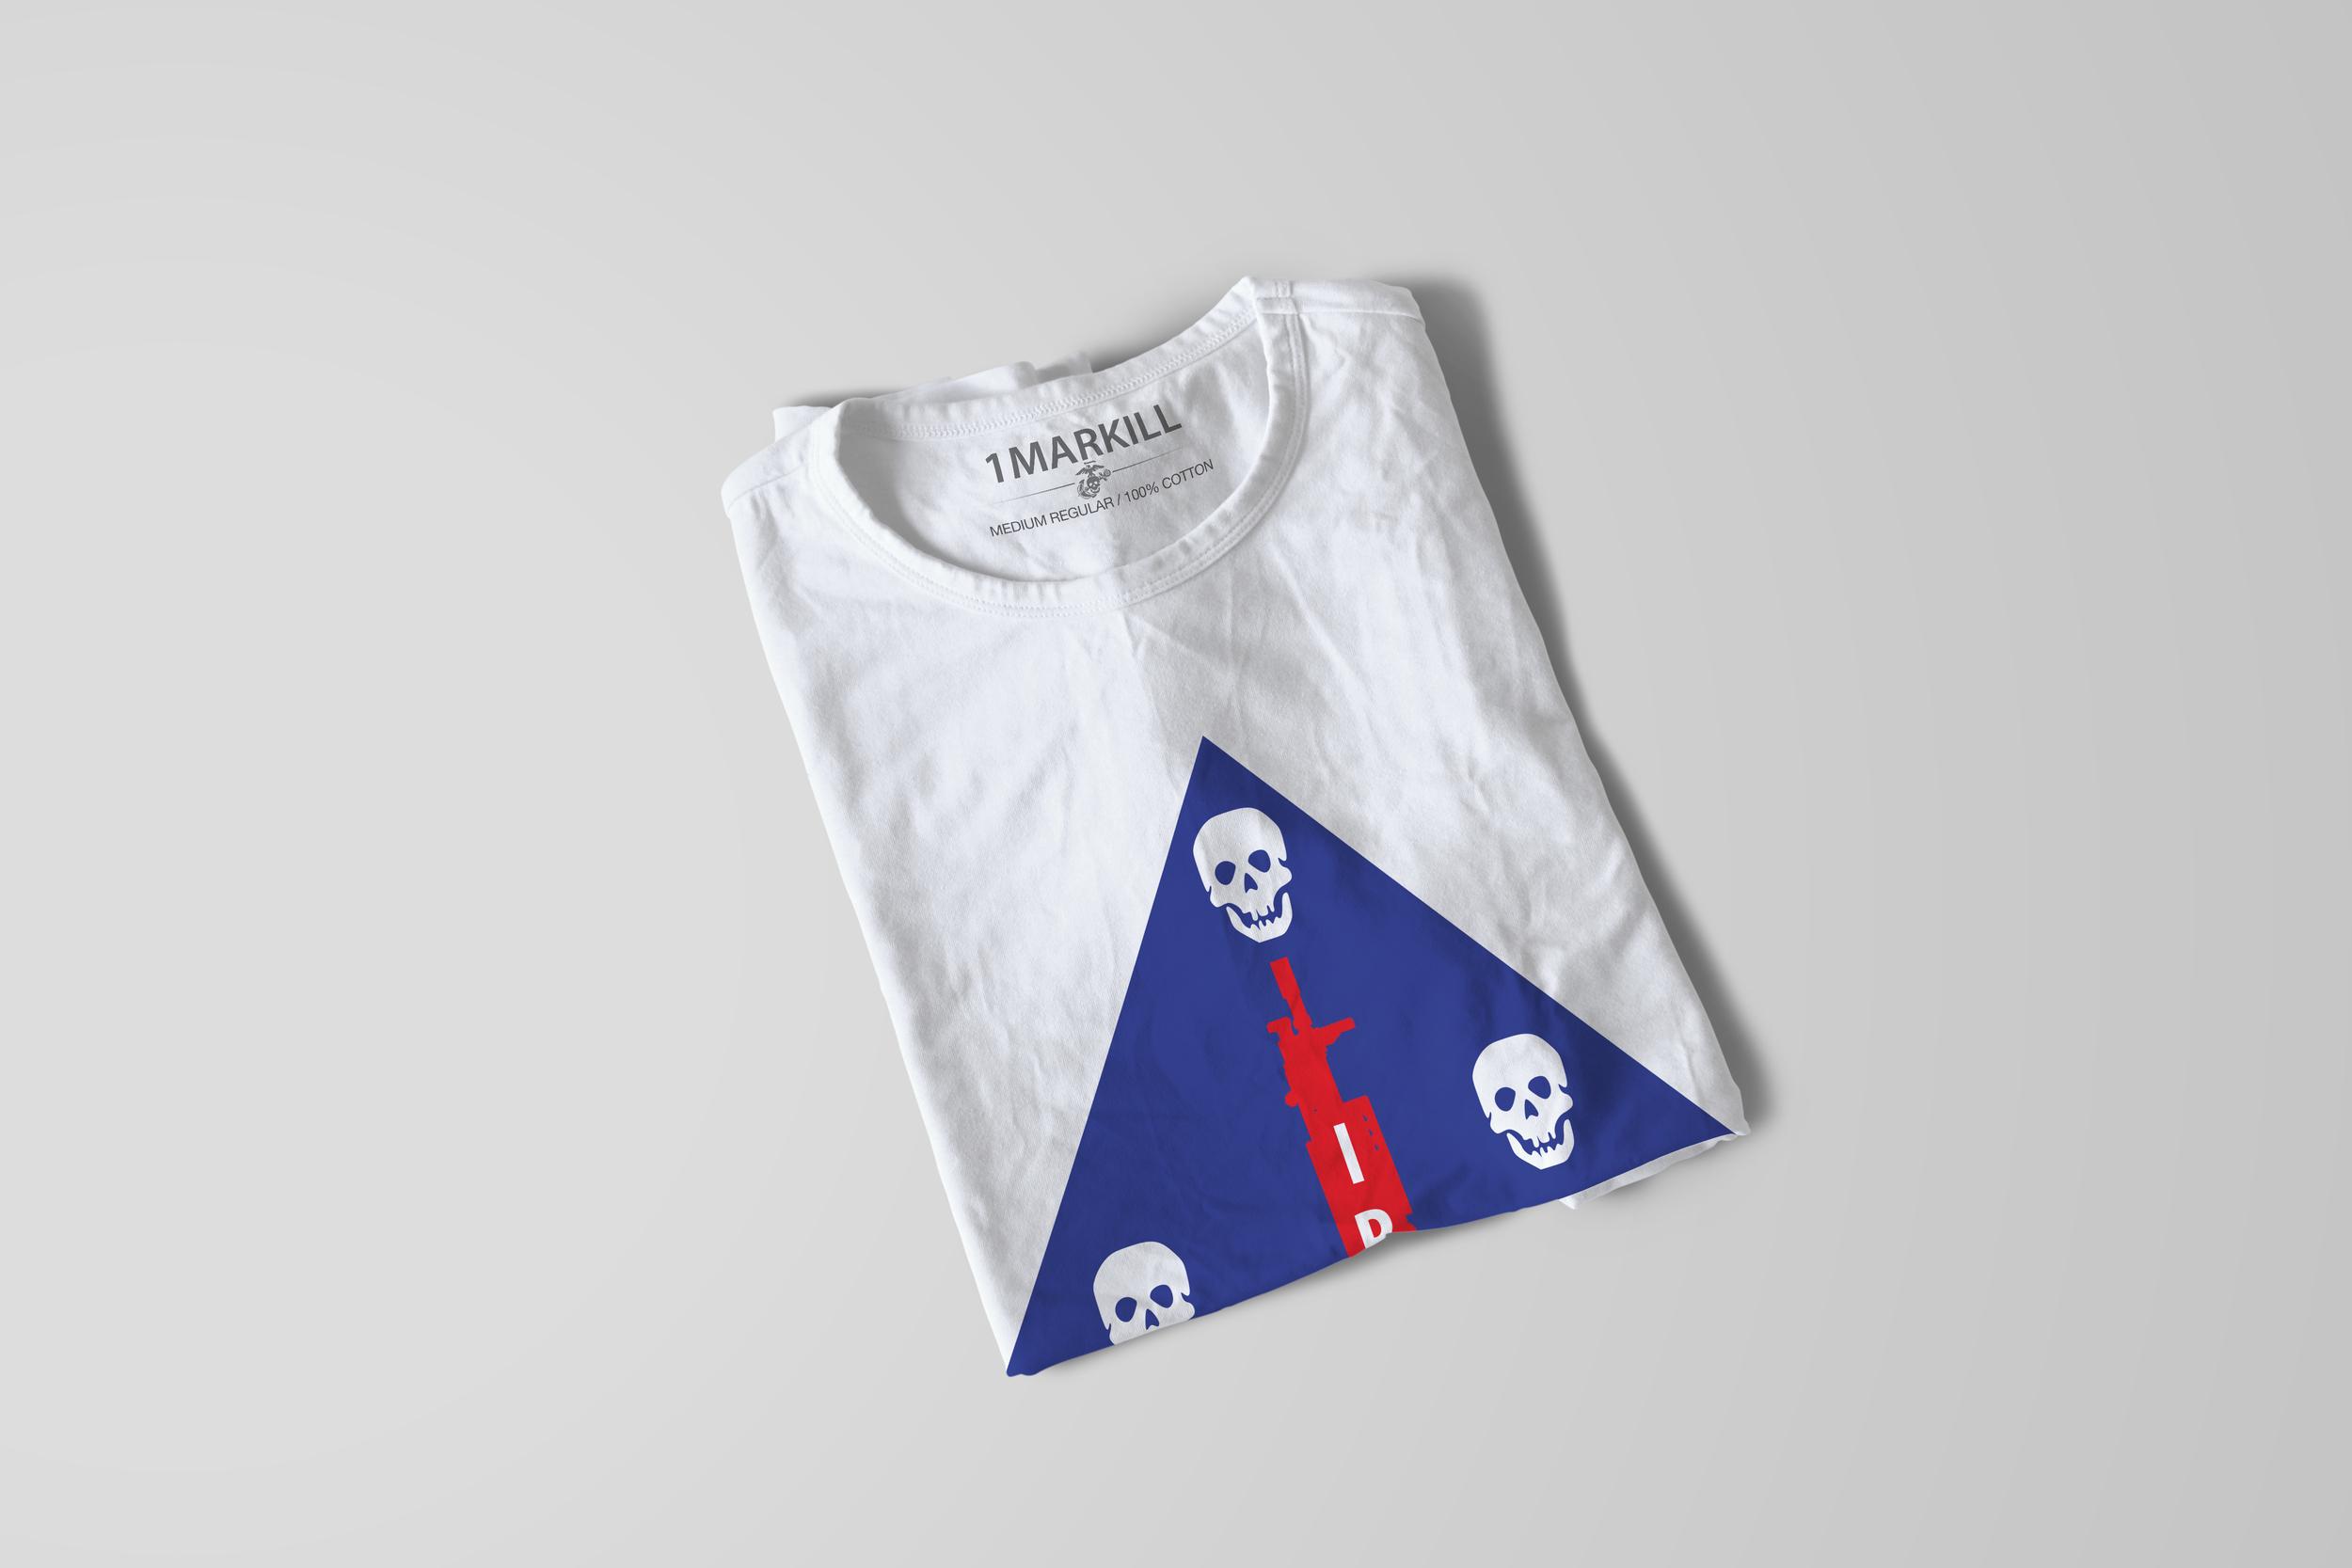 USMC Eagle Skull and Anchor Logo on 1STMARKILL shirt